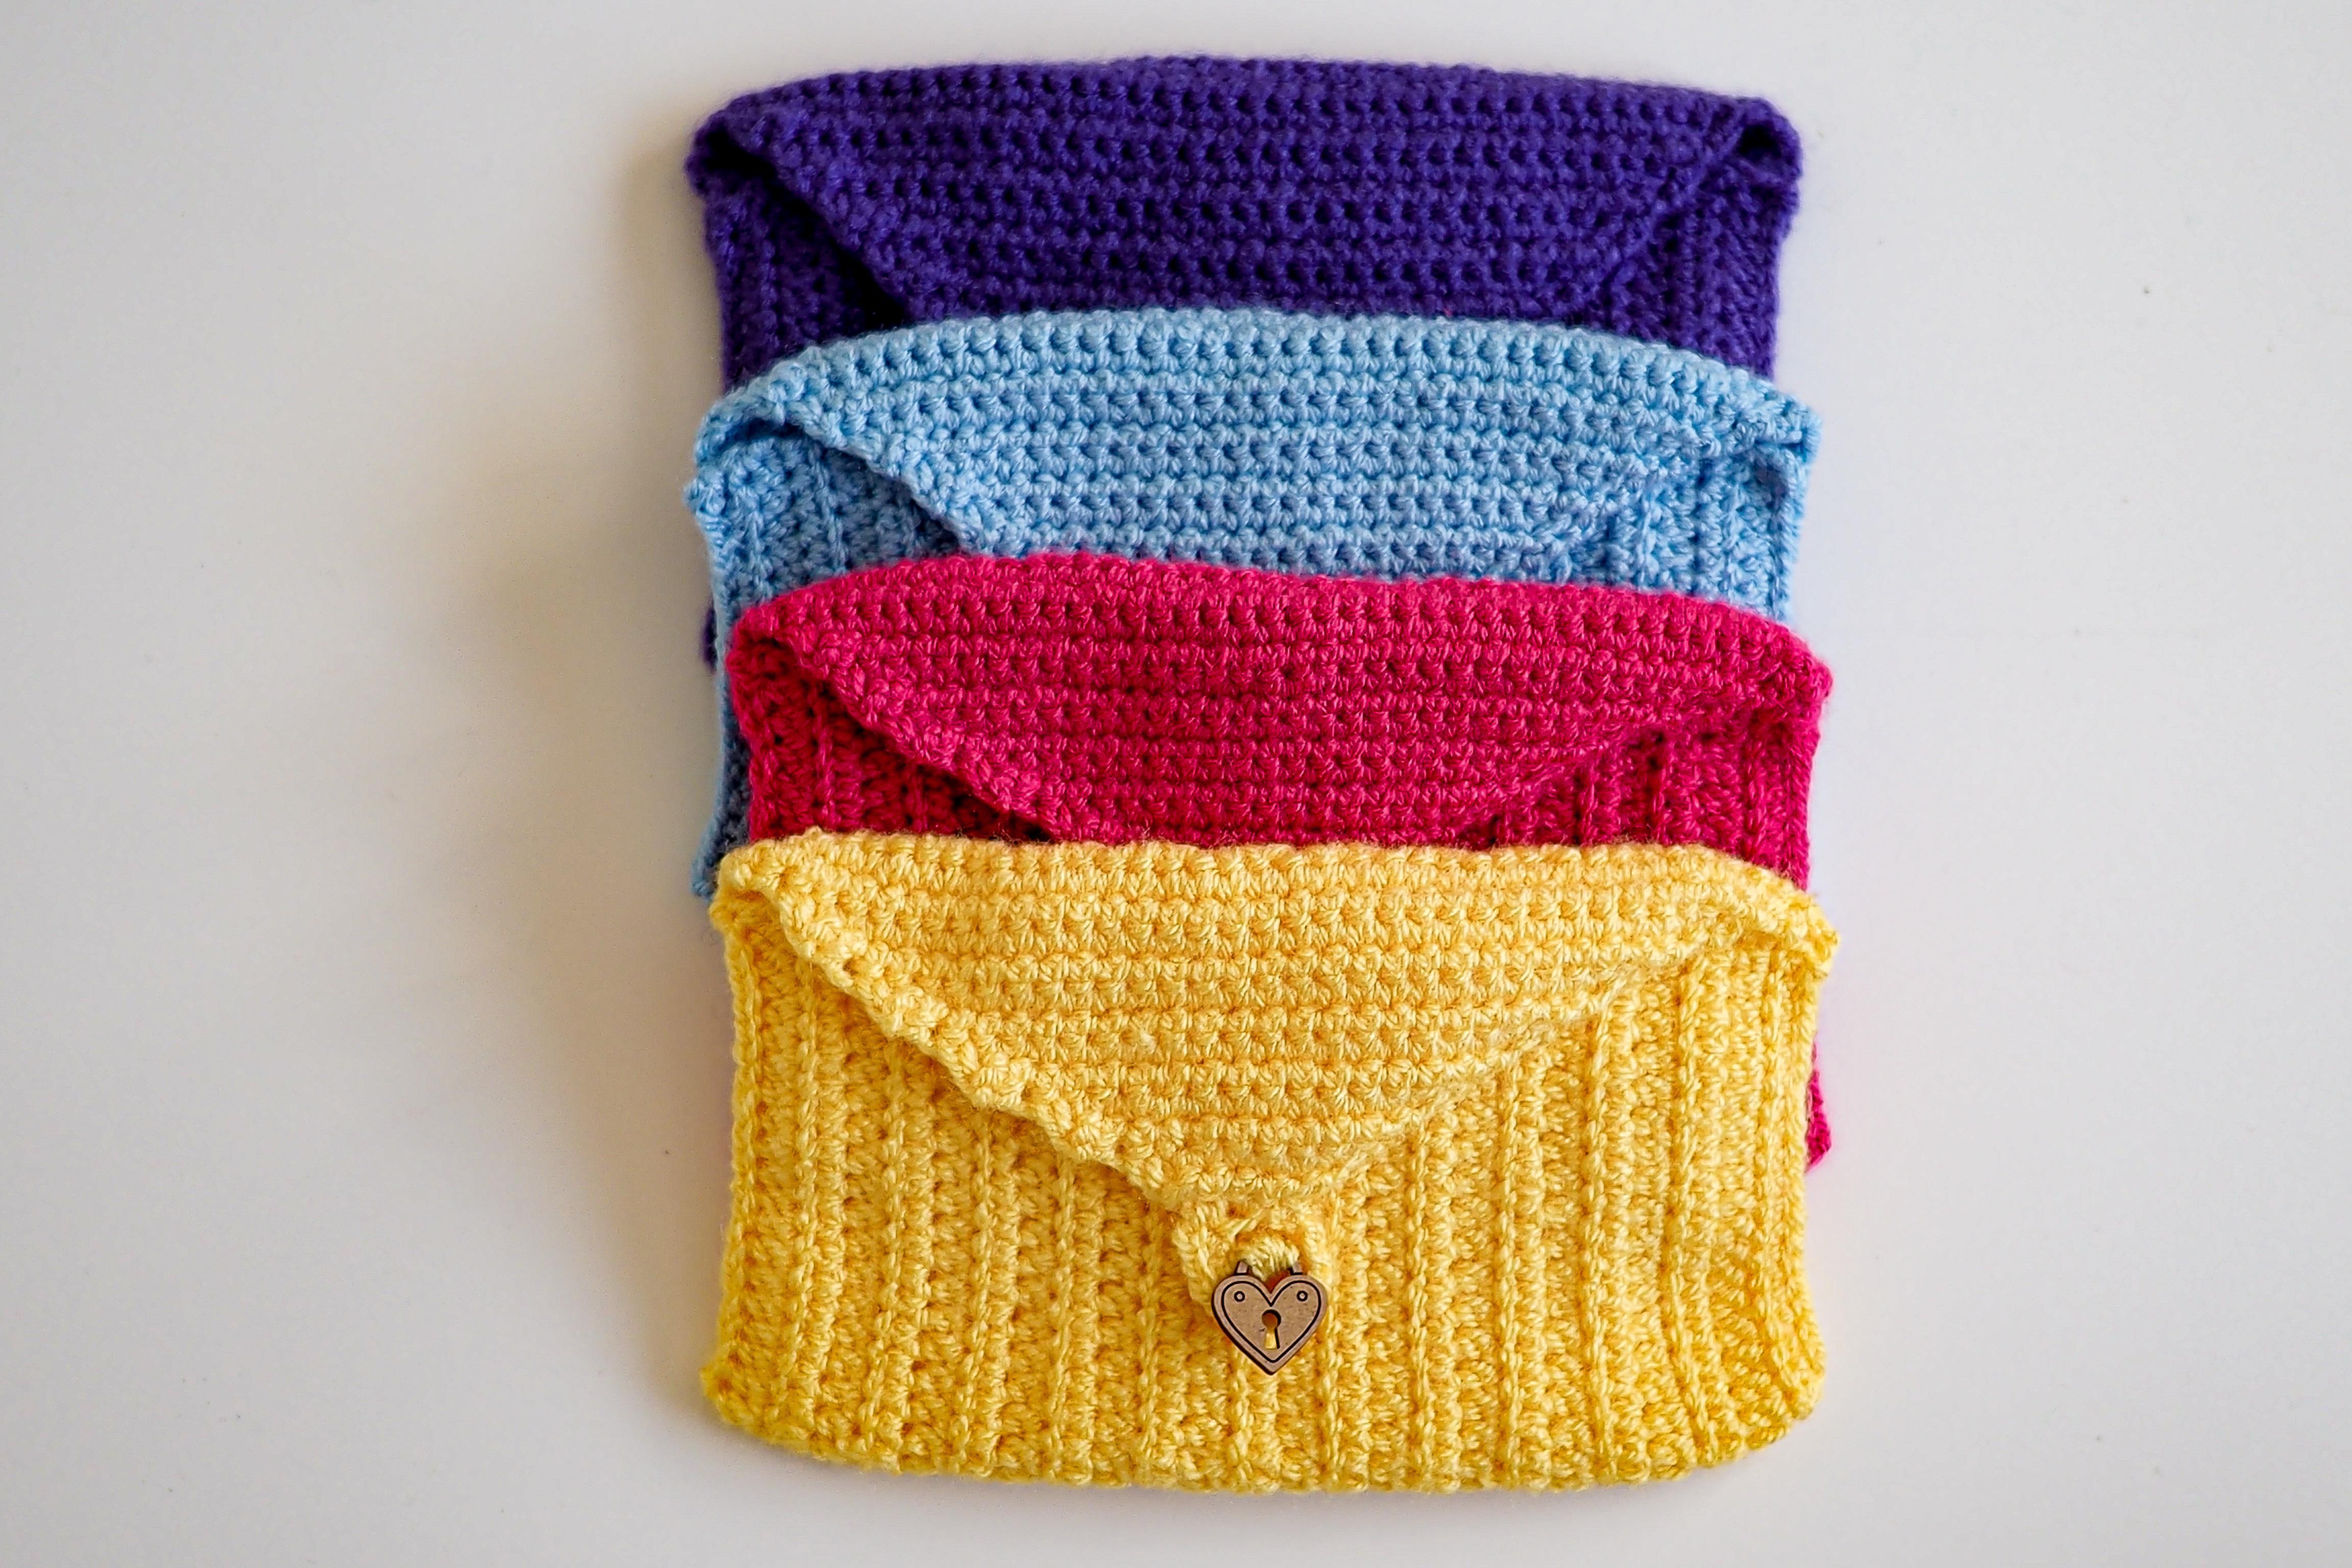 crochet small project bag